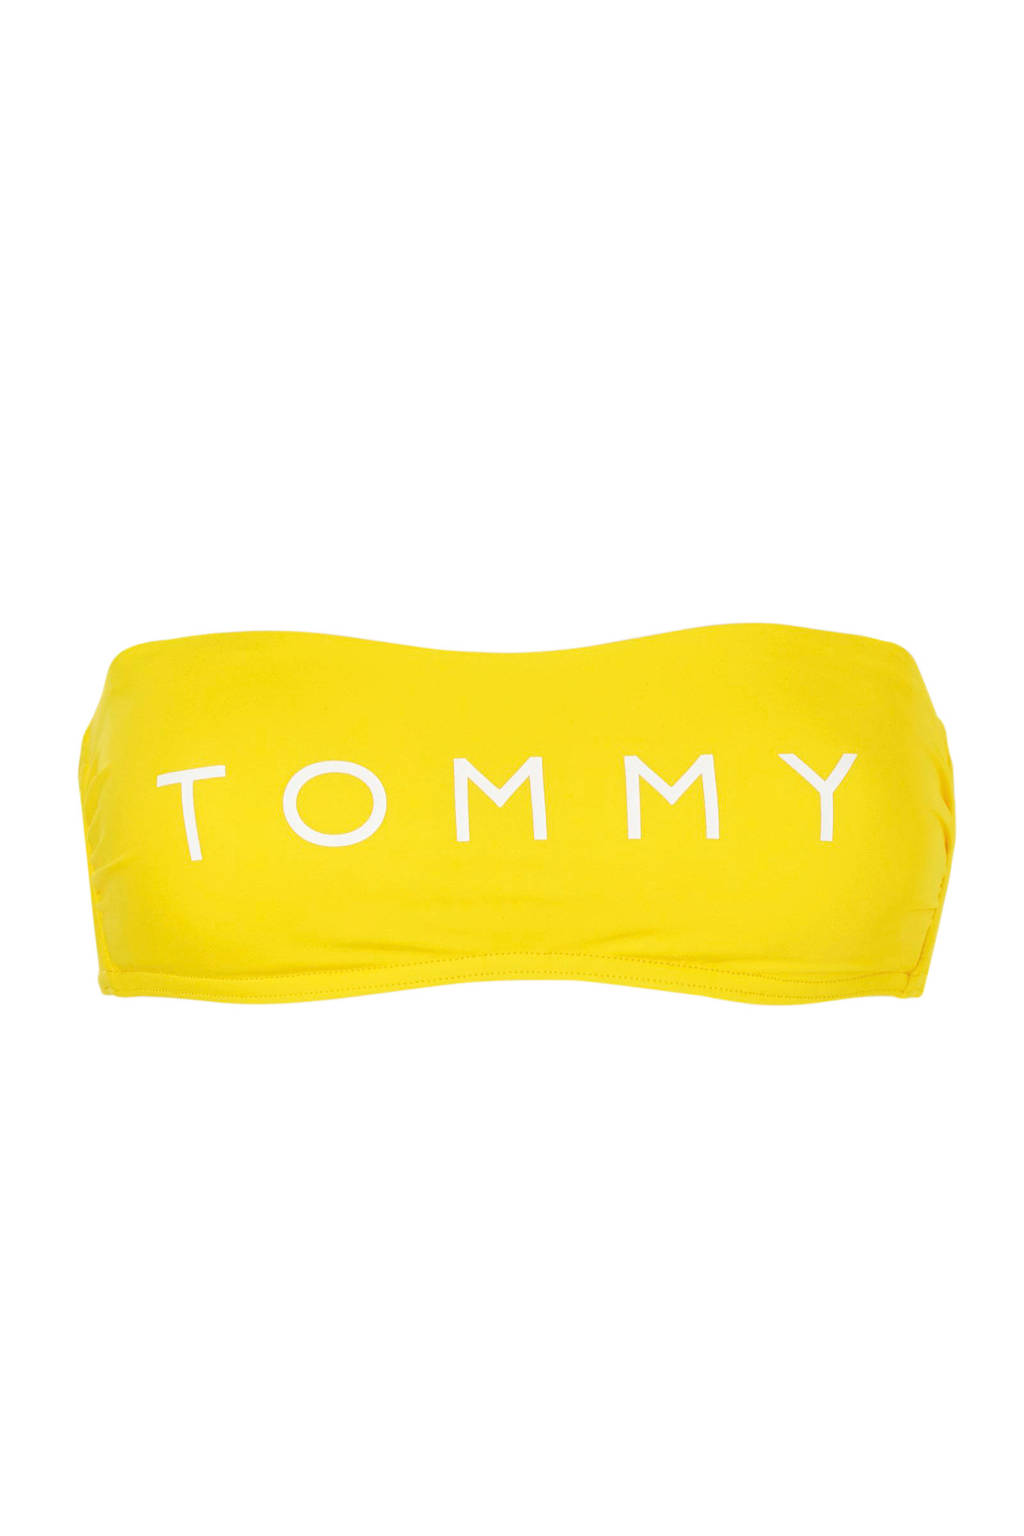 Tommy Merknaam Hilfigerbandeau Met Geel Bikinitop nqTS8fF